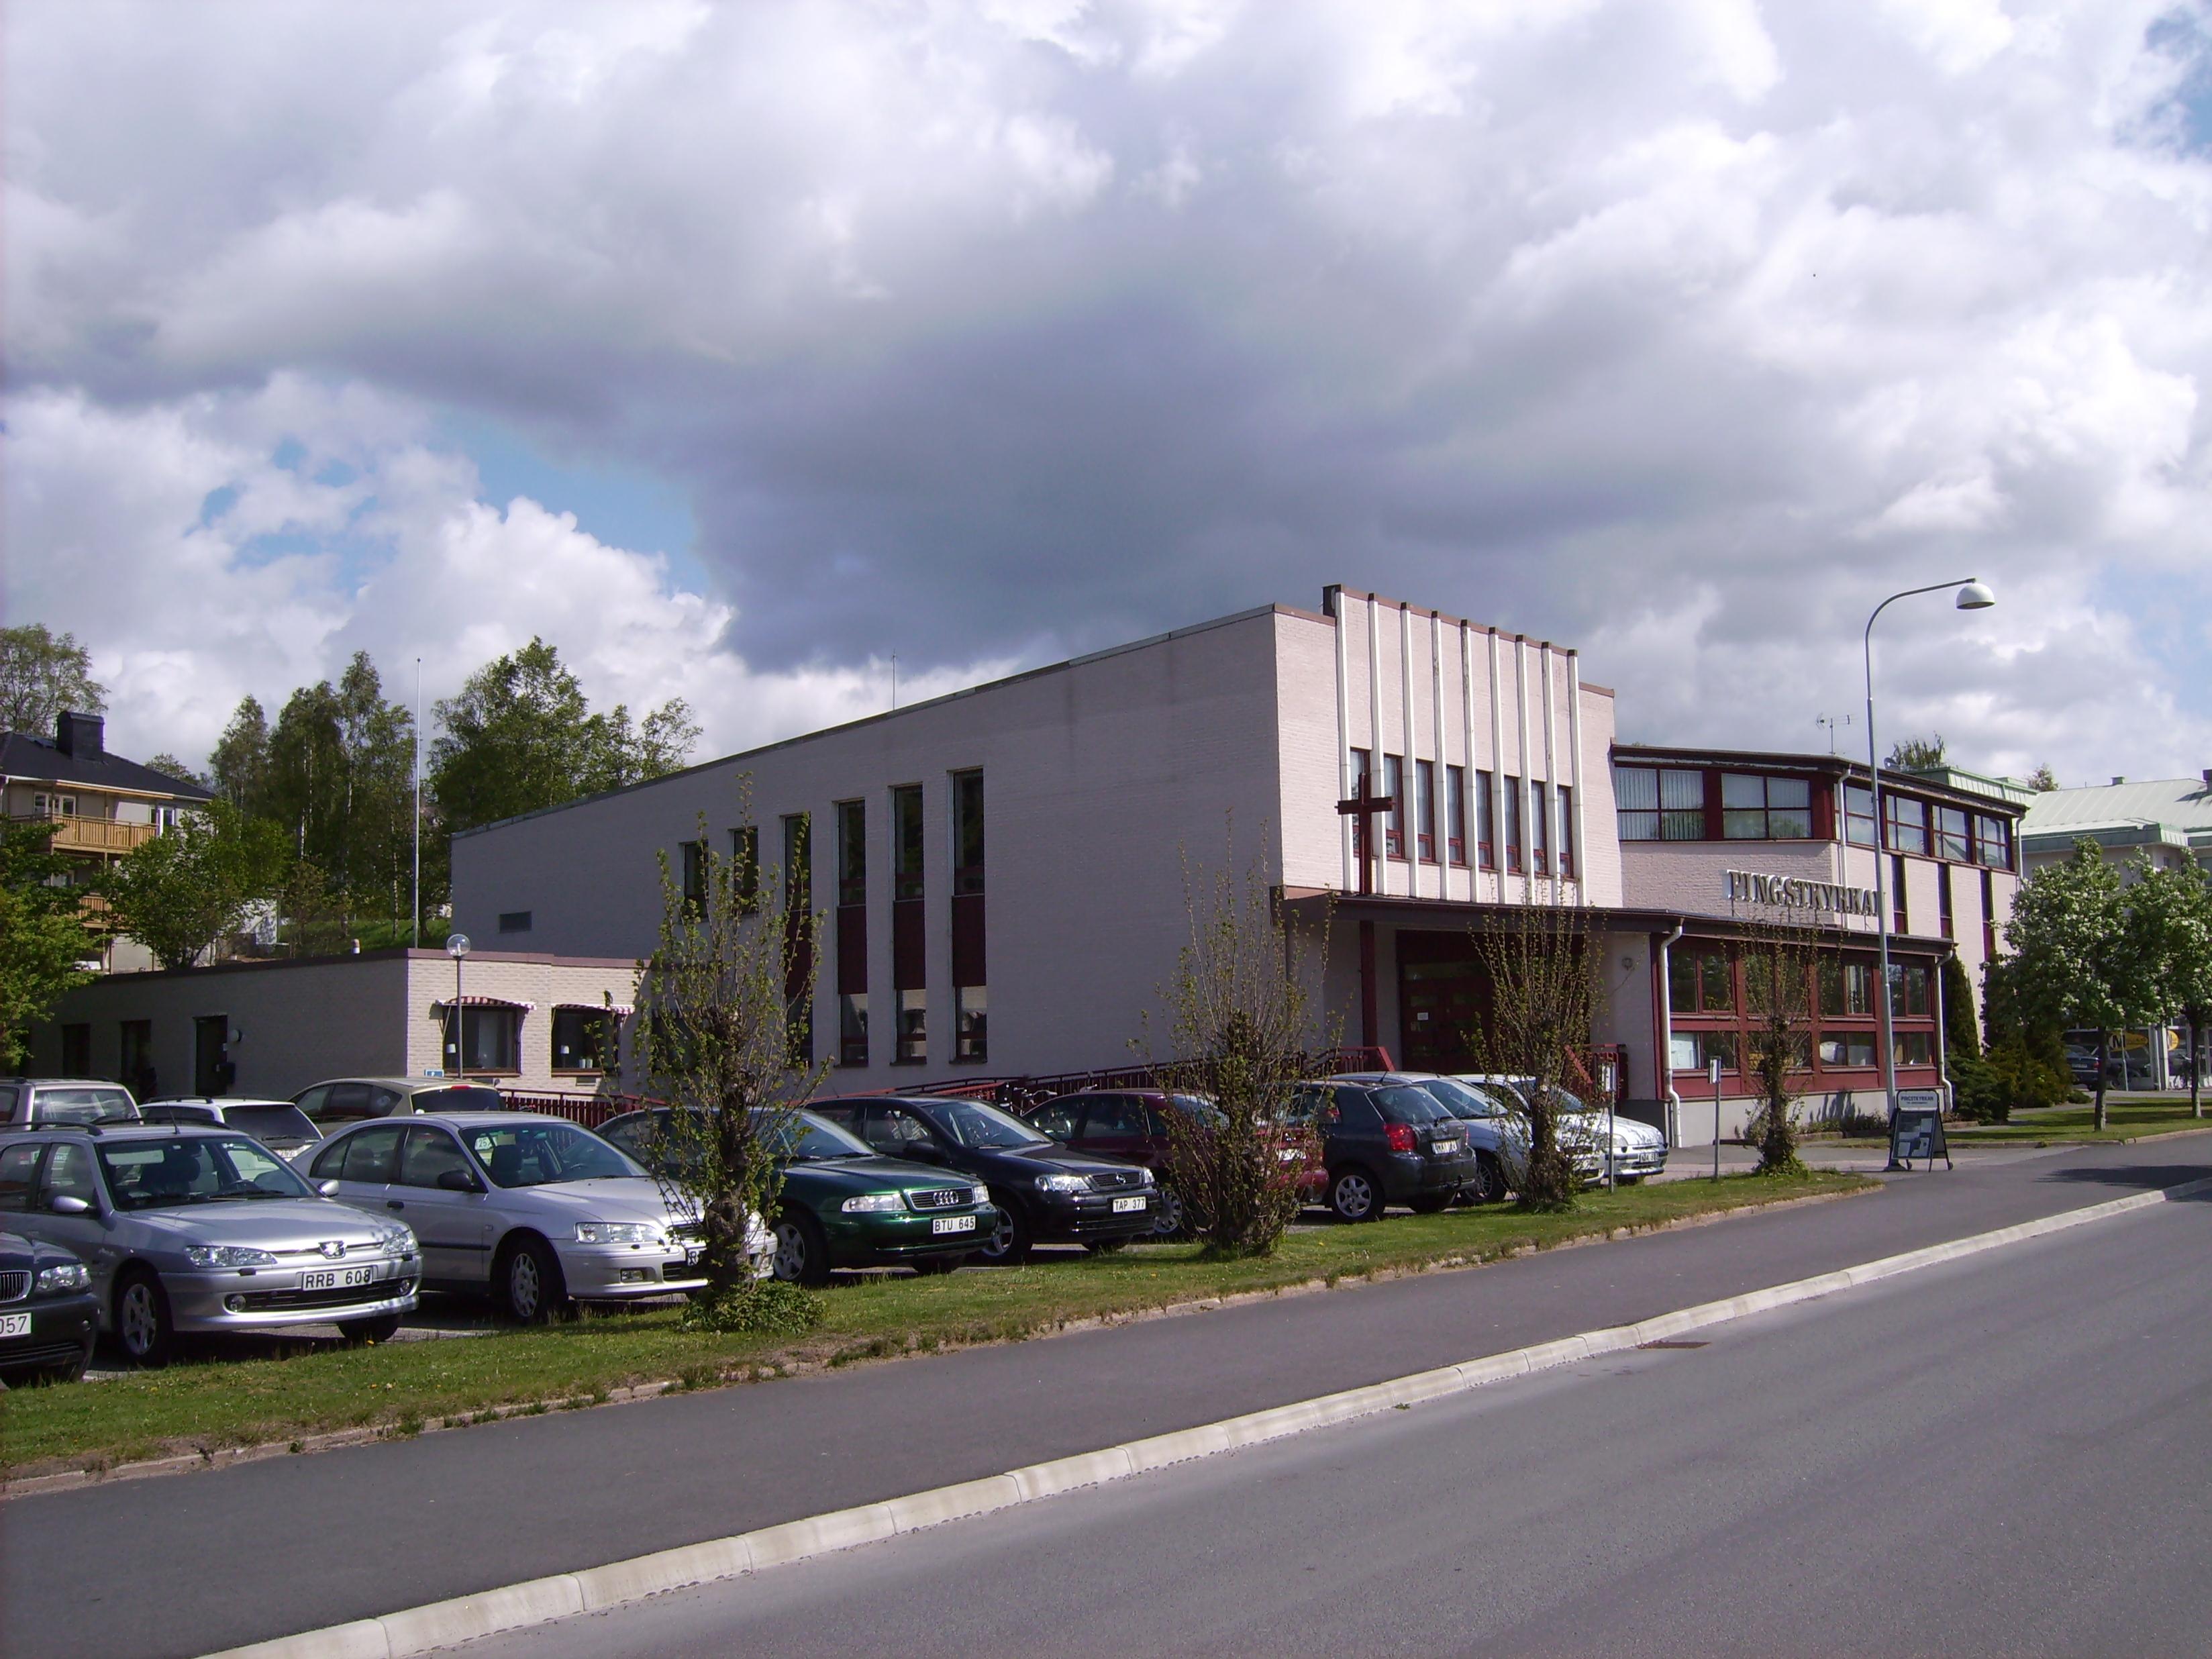 Hrligt hus i Mullsj, Jnkping - Houses for Rent in - Airbnb